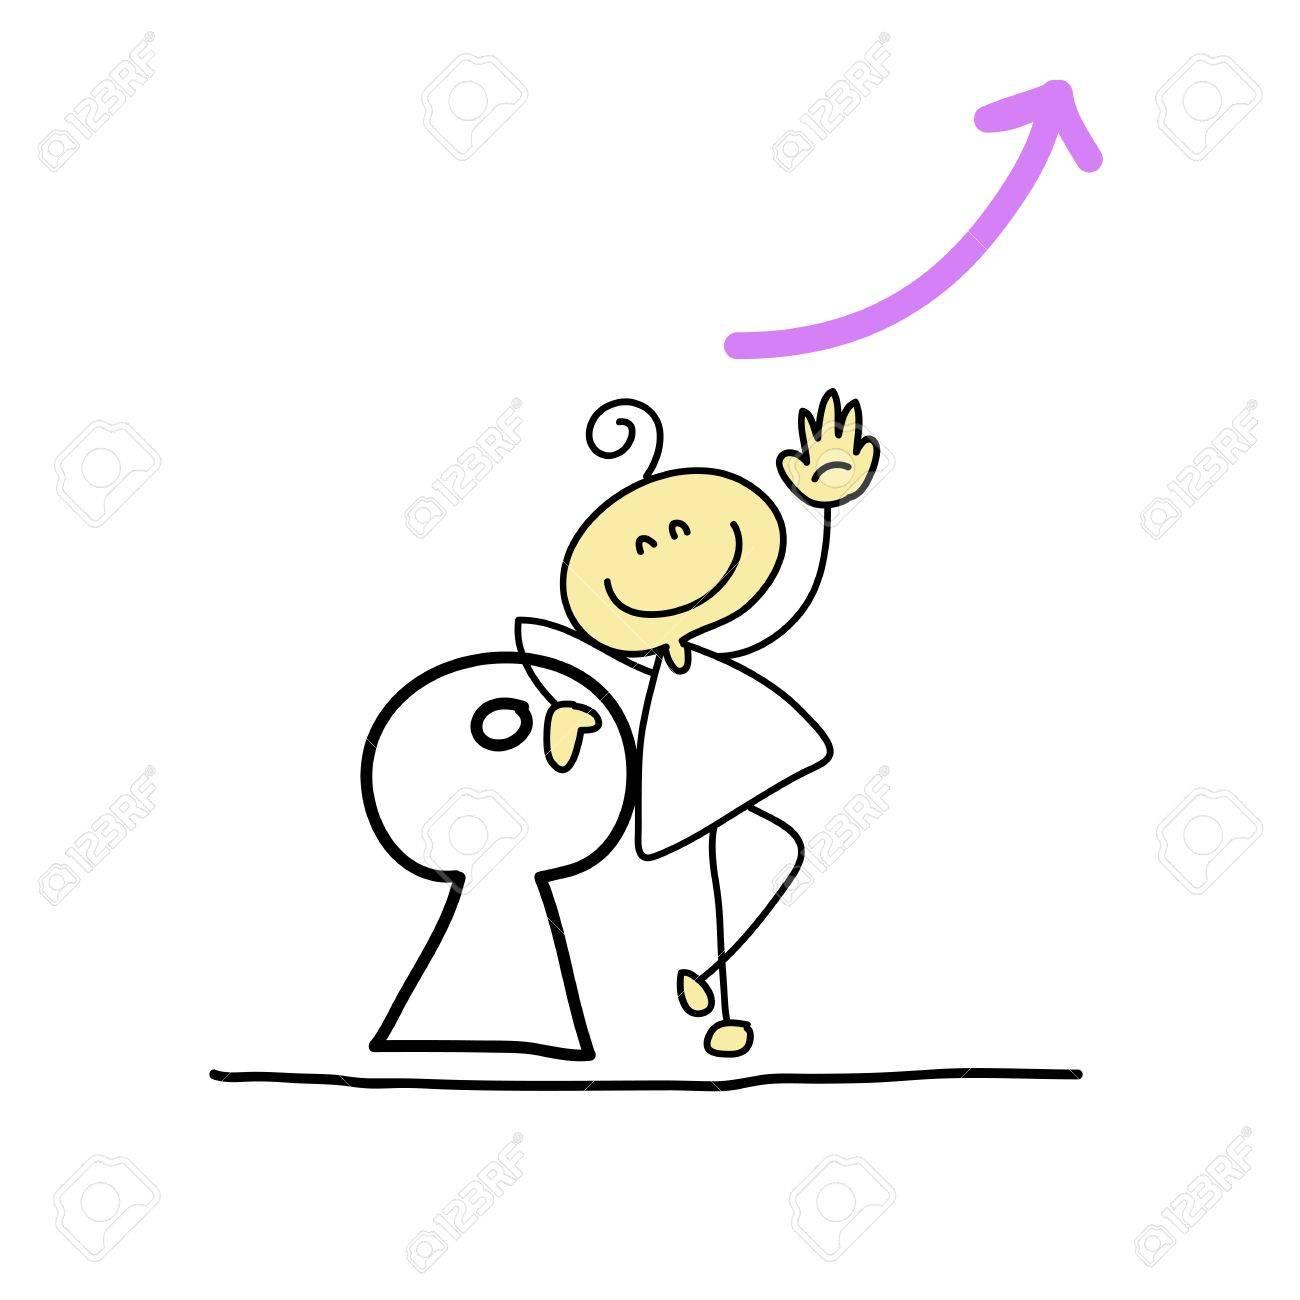 hand drawing cartoon characters creativity for presentation Stock Vector - 19140555